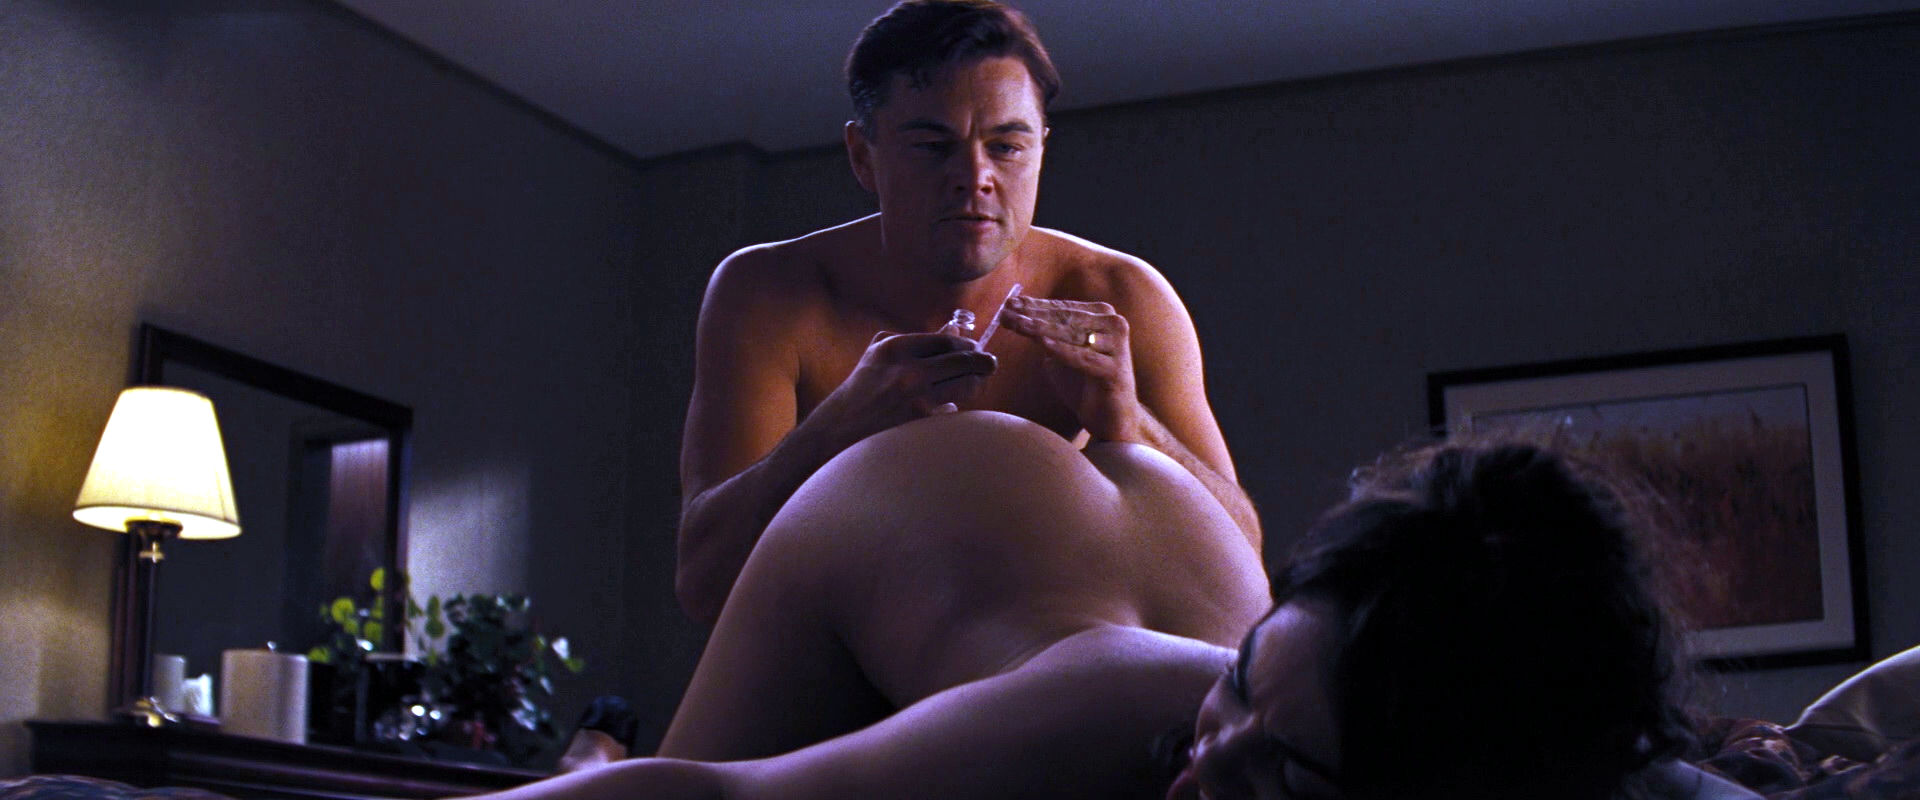 Ebony stomach jizz black girl belly cumshots